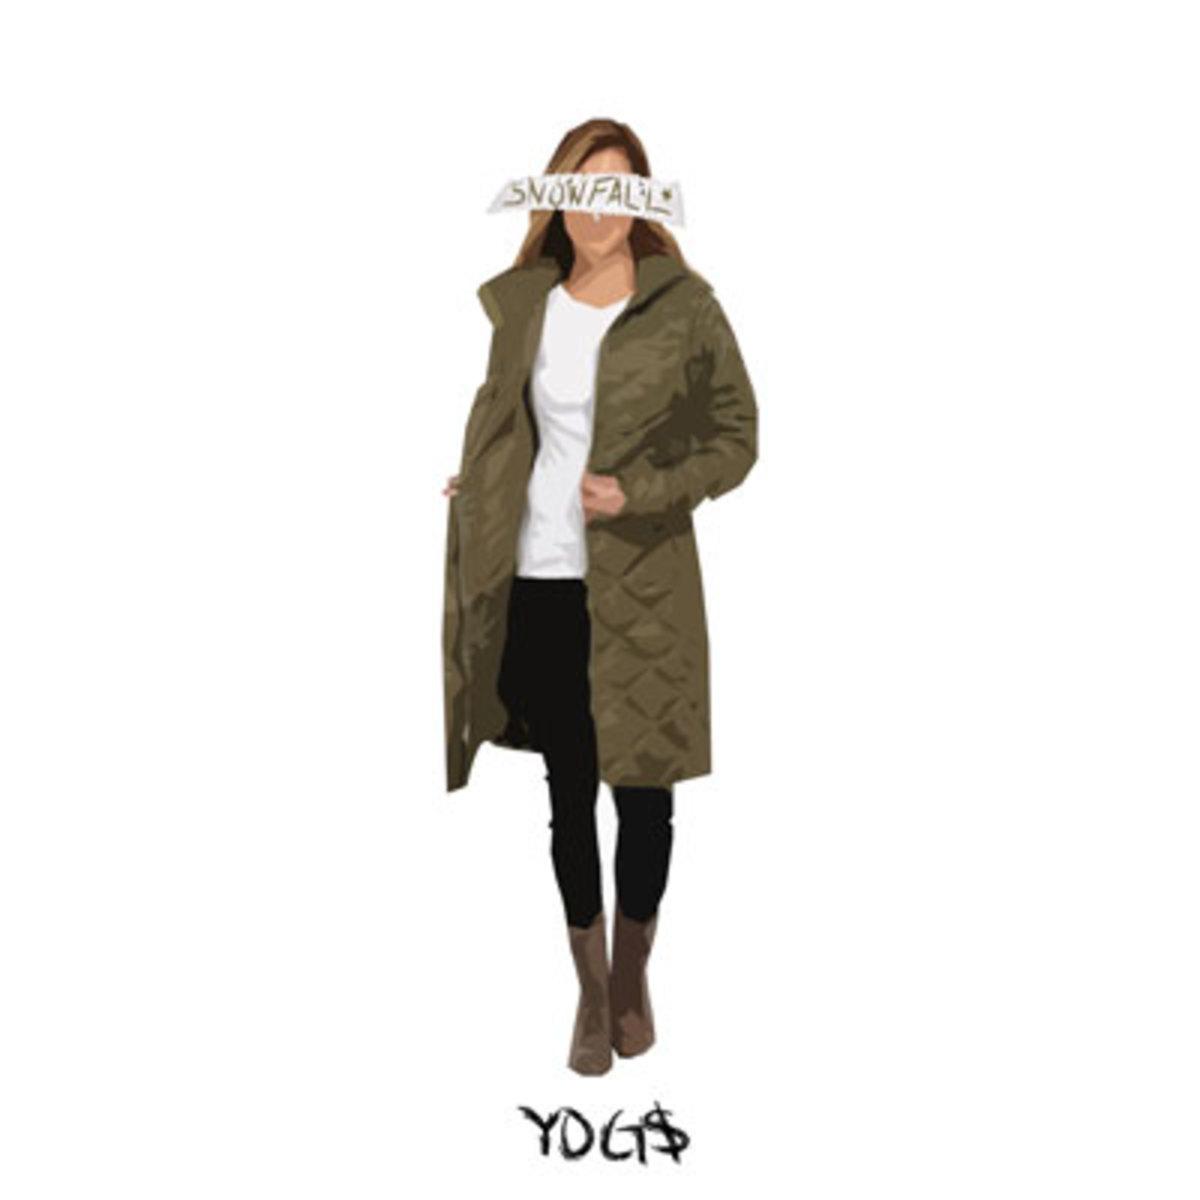 yogs-snowfall.jpg